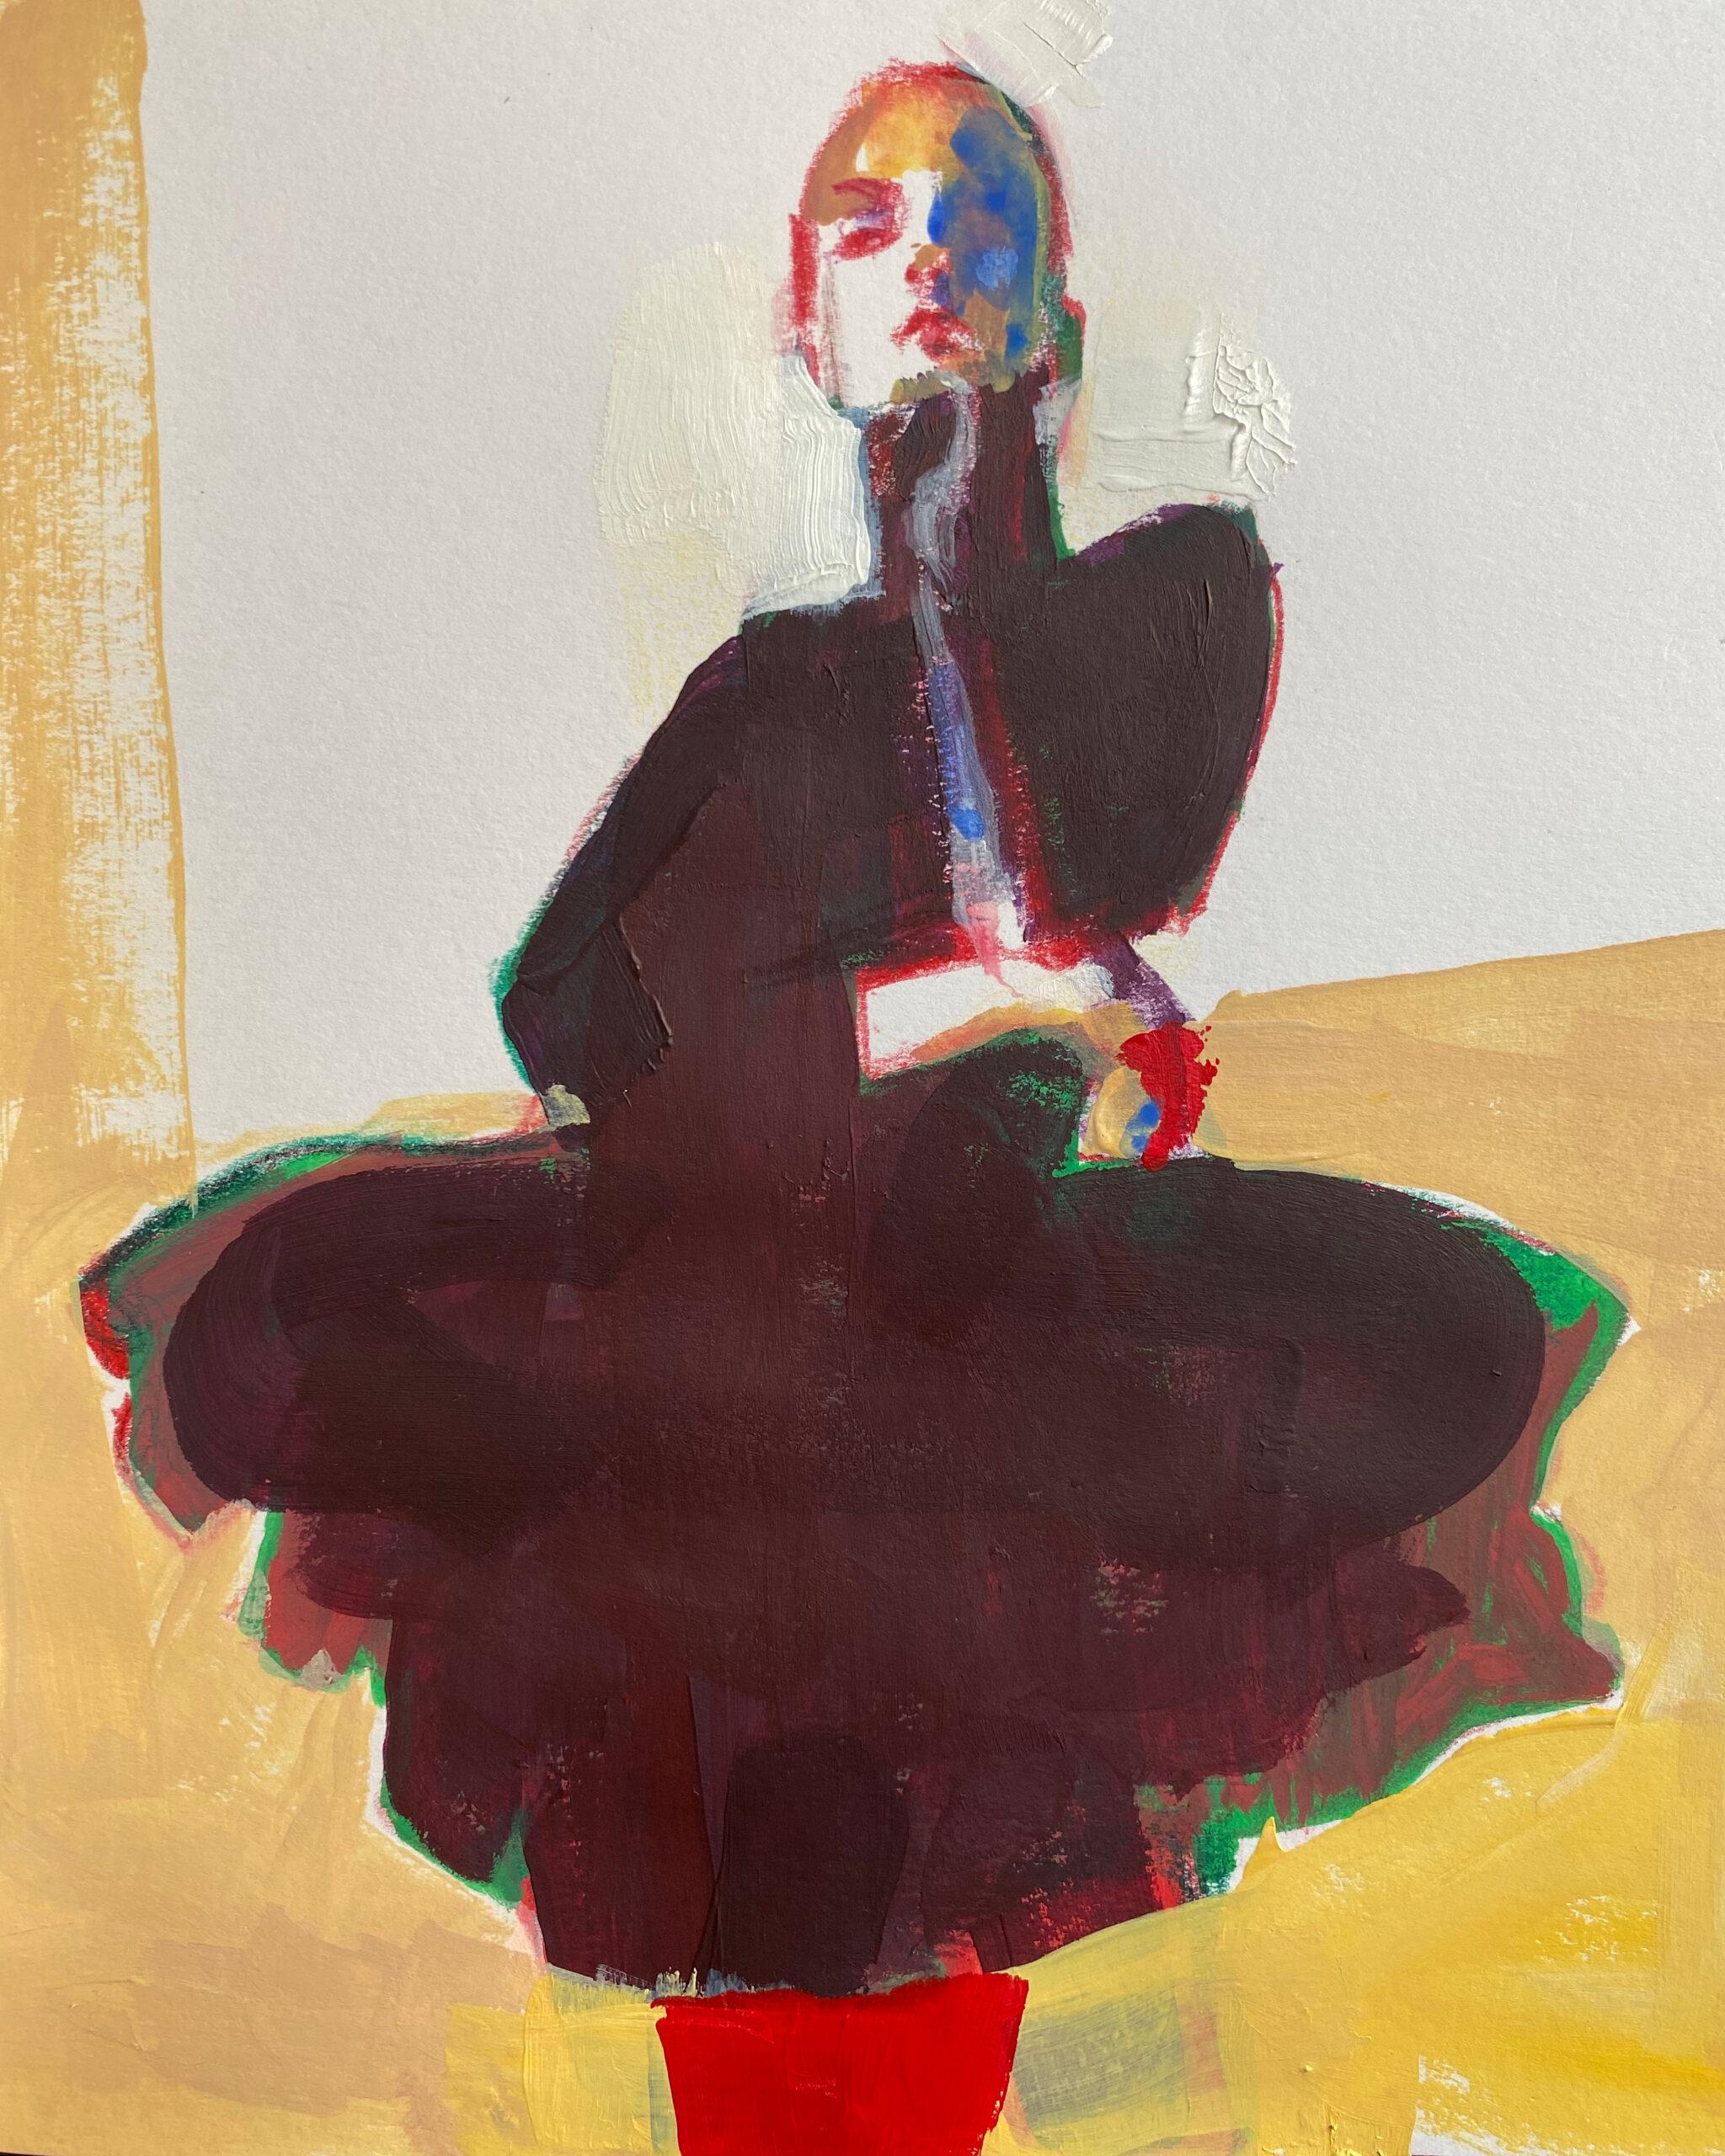 Harrogate Gallery, Chris Gambrell, Miumiu